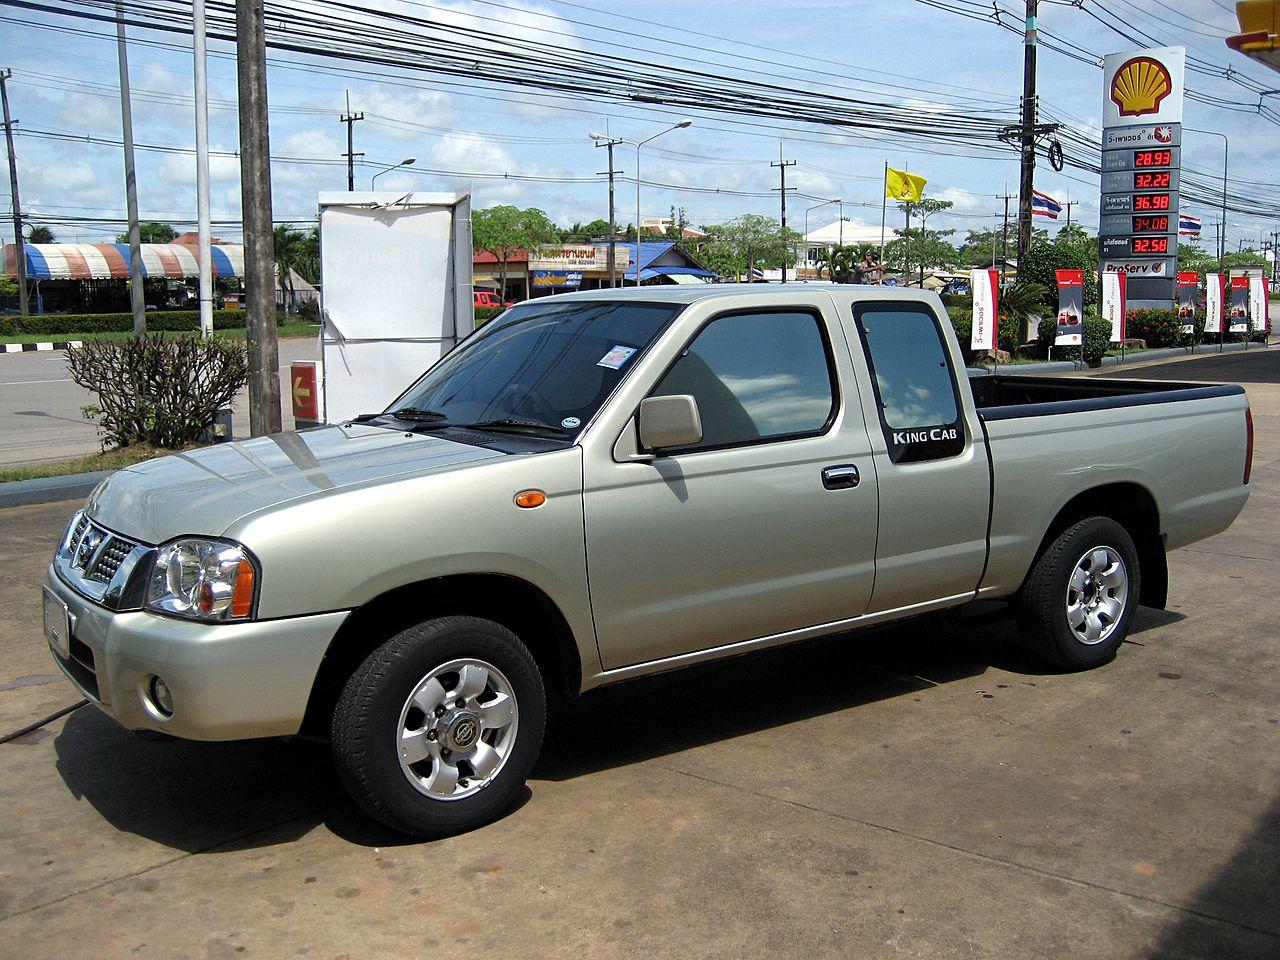 File:Nissan Frontier TL TD27 2003.JPG